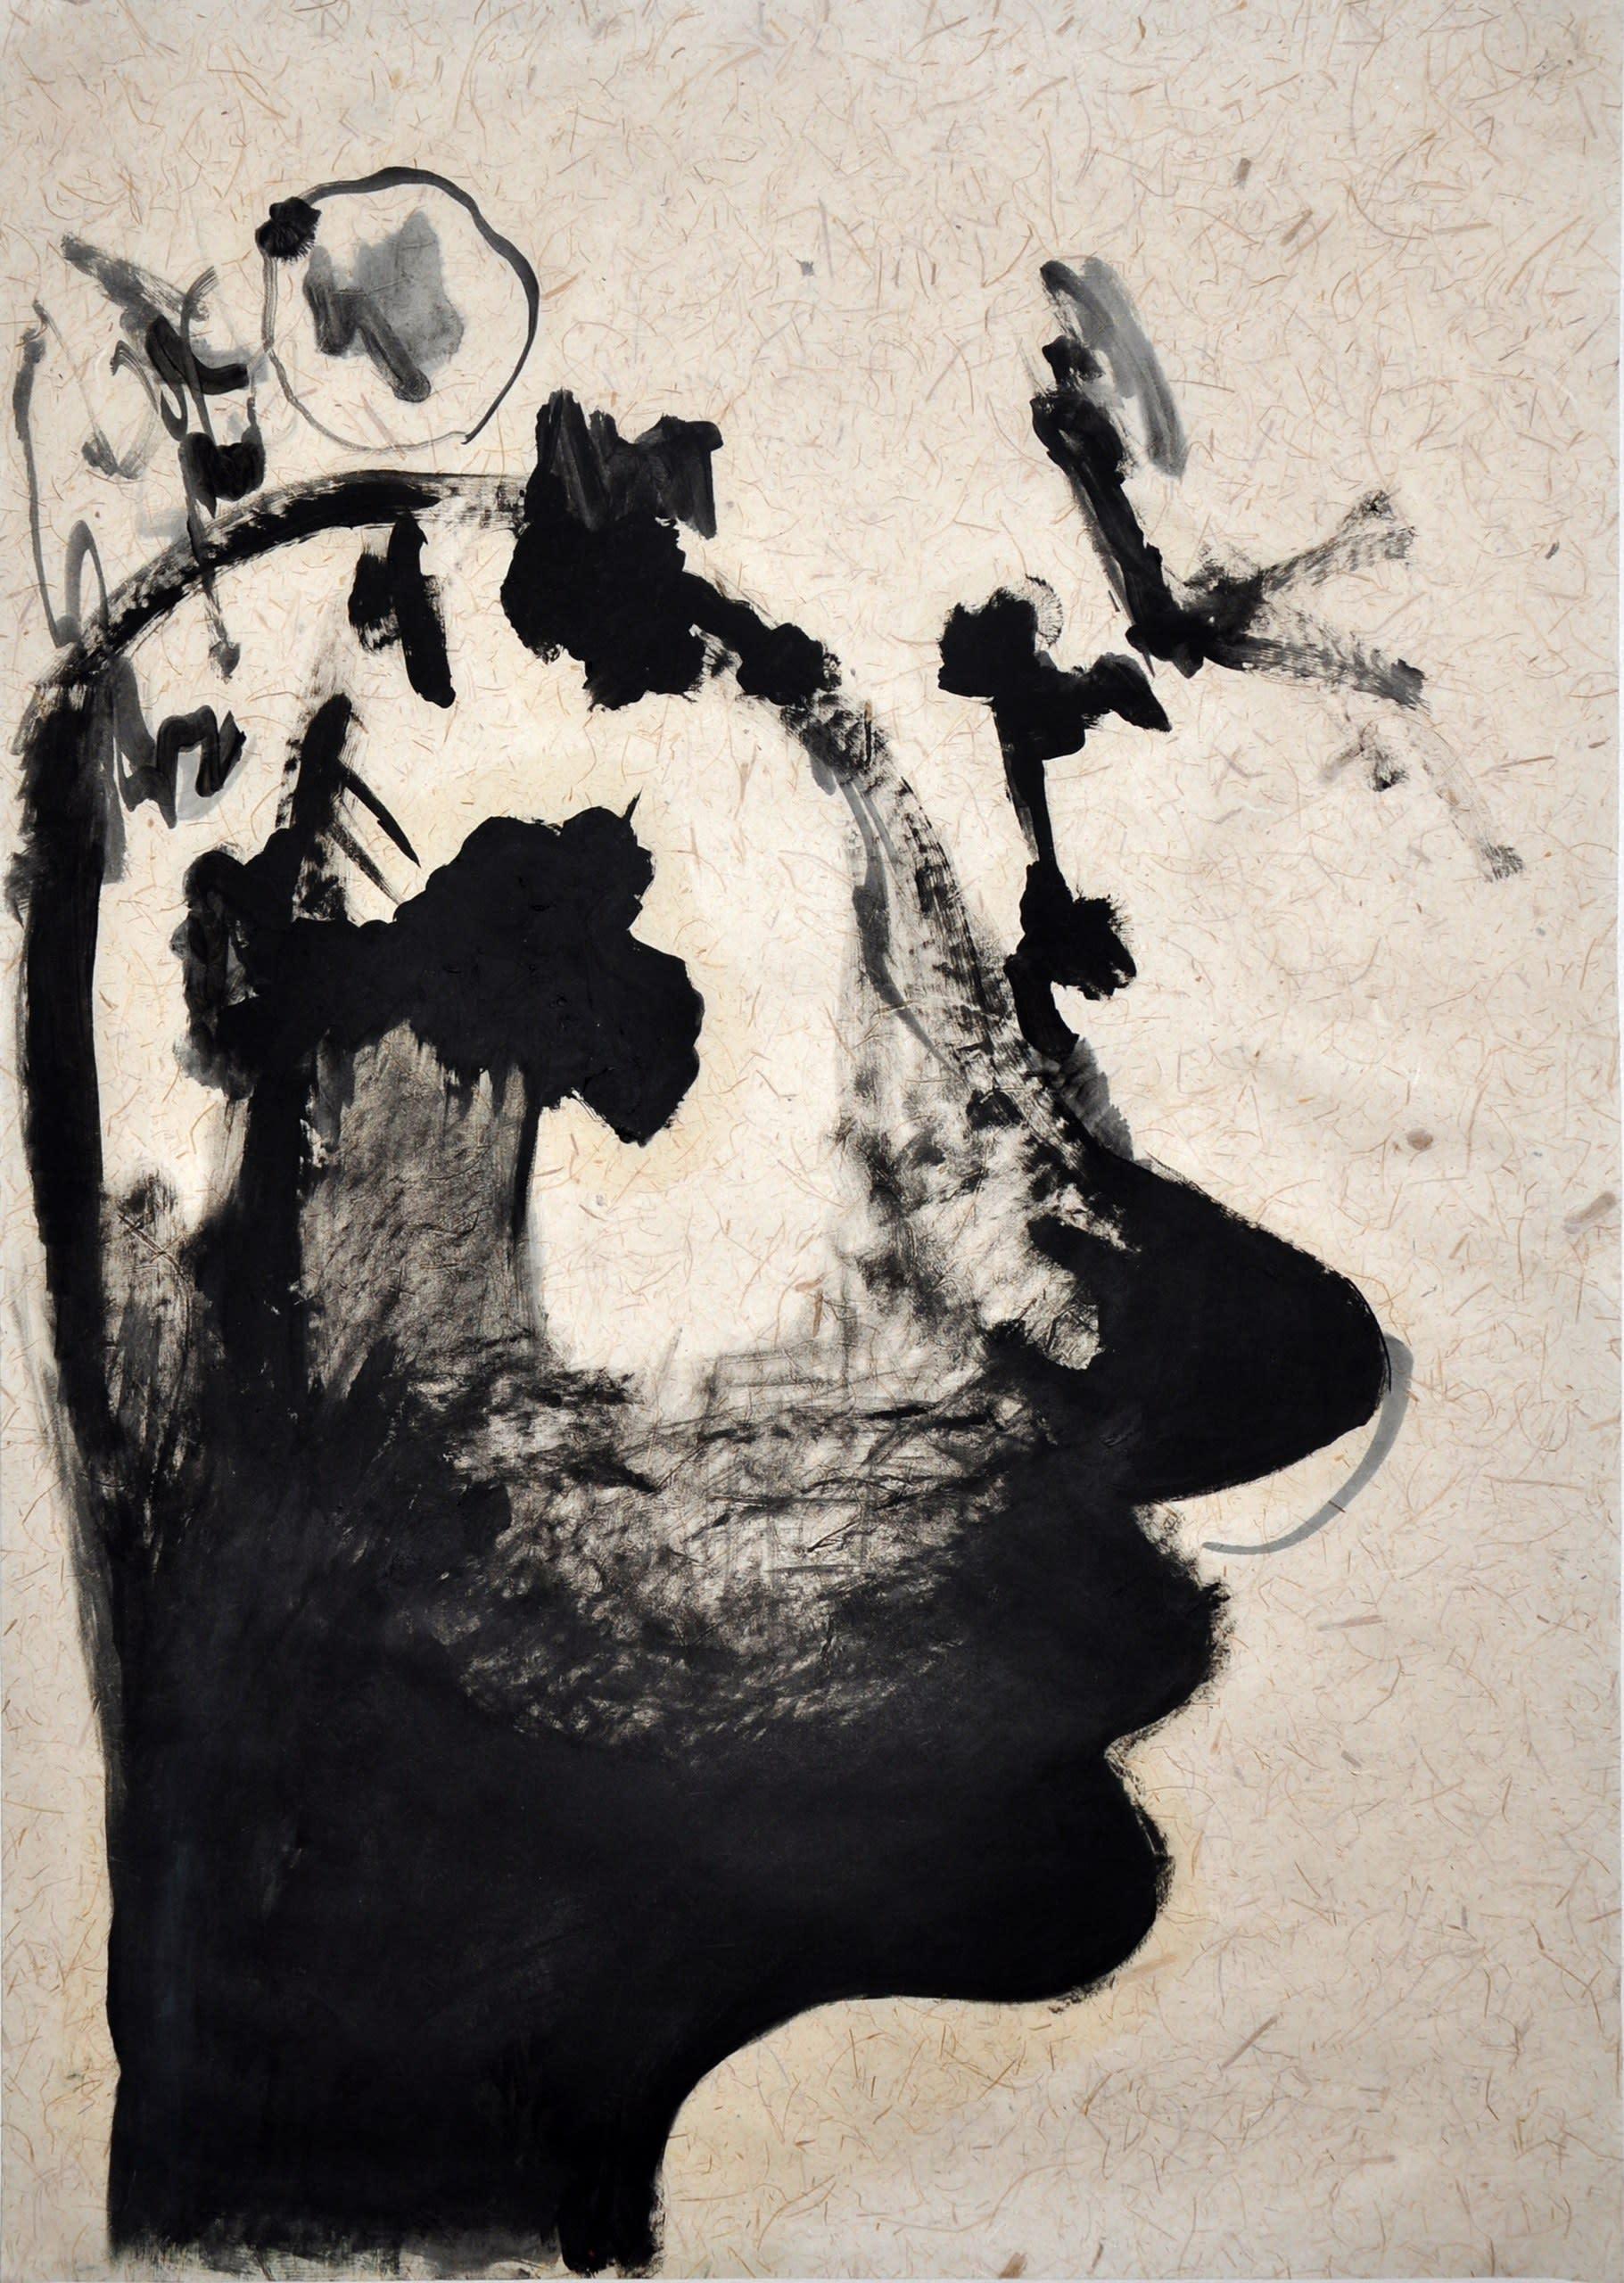 Untitled self - portrait 9 2020